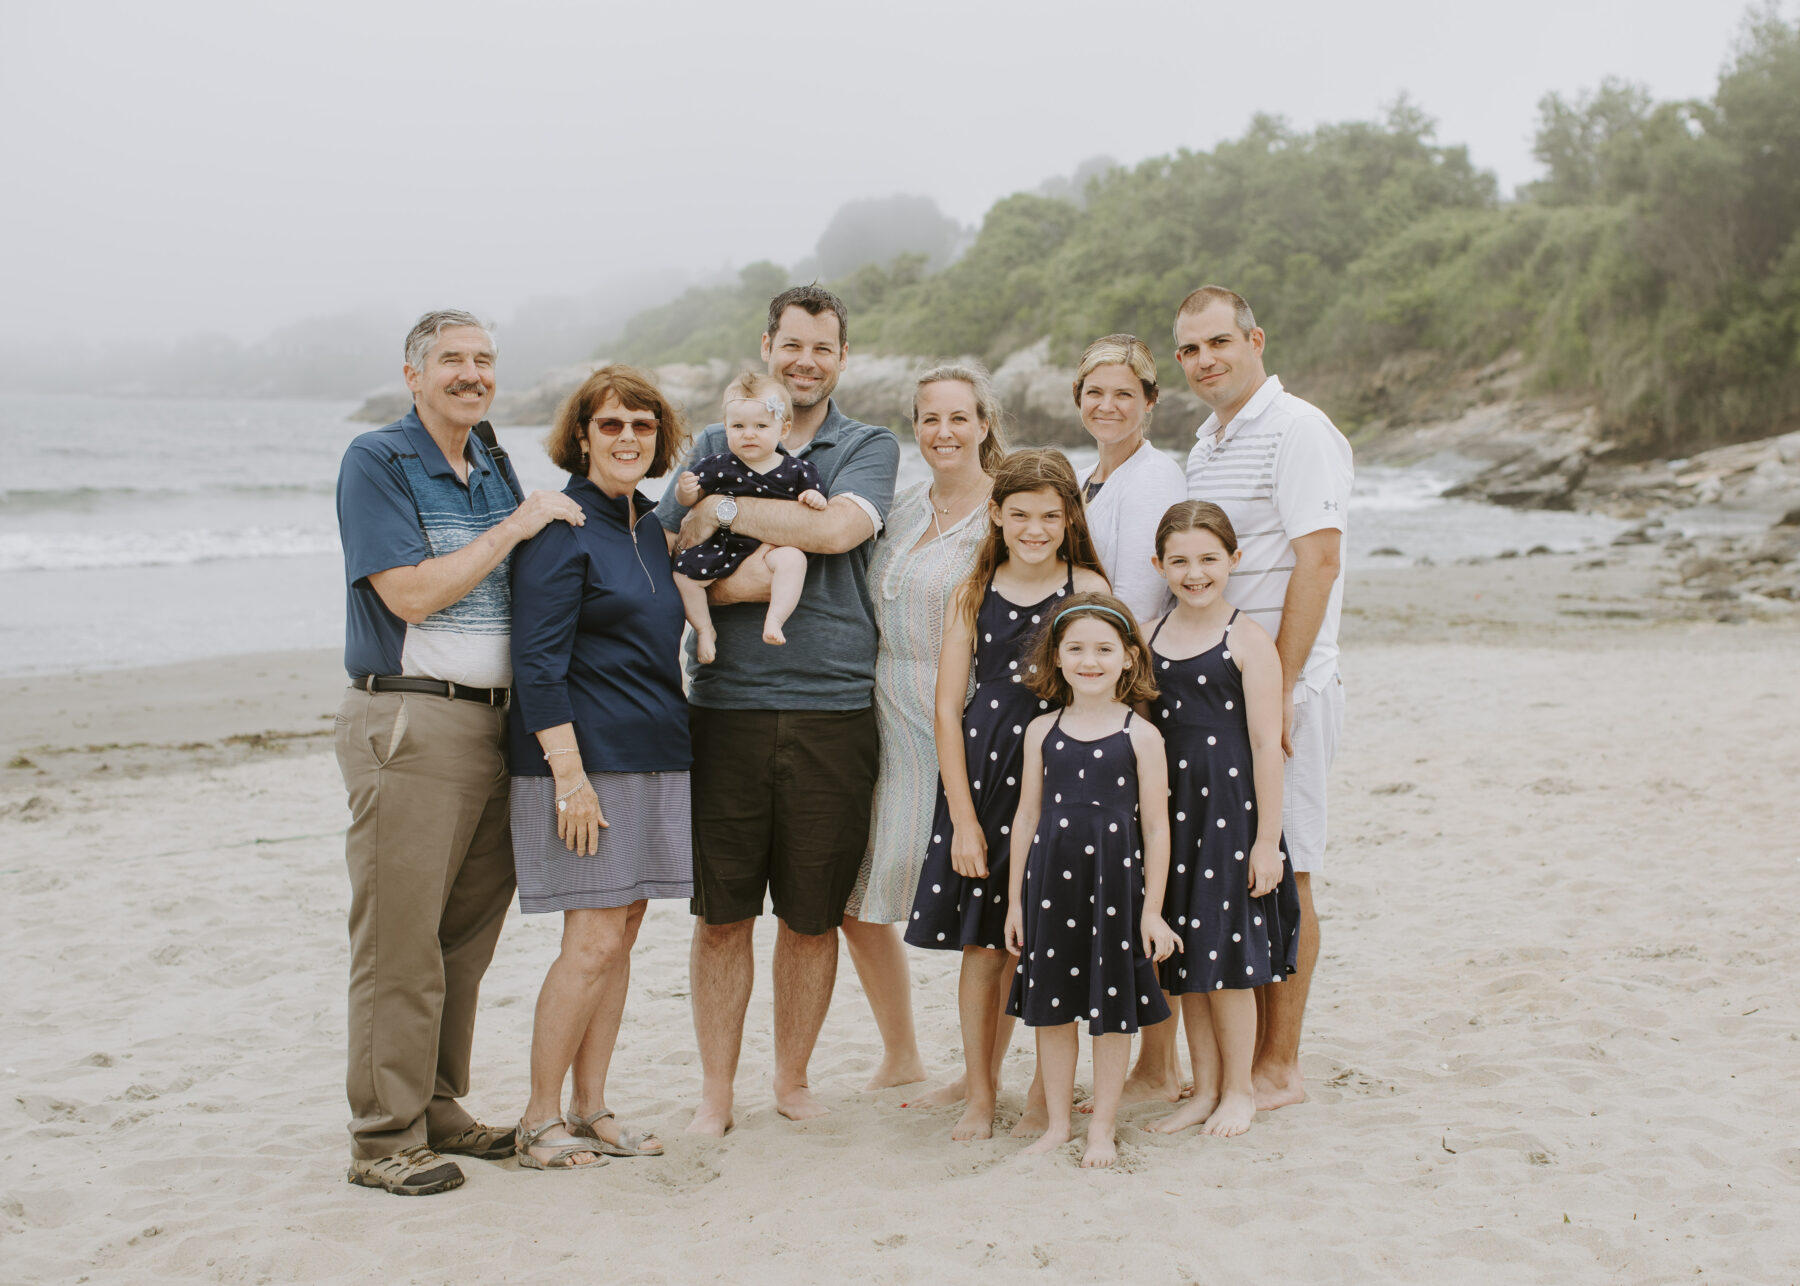 Rhode Island Beach Family Session Jen and Mark Blueflash Photography 1